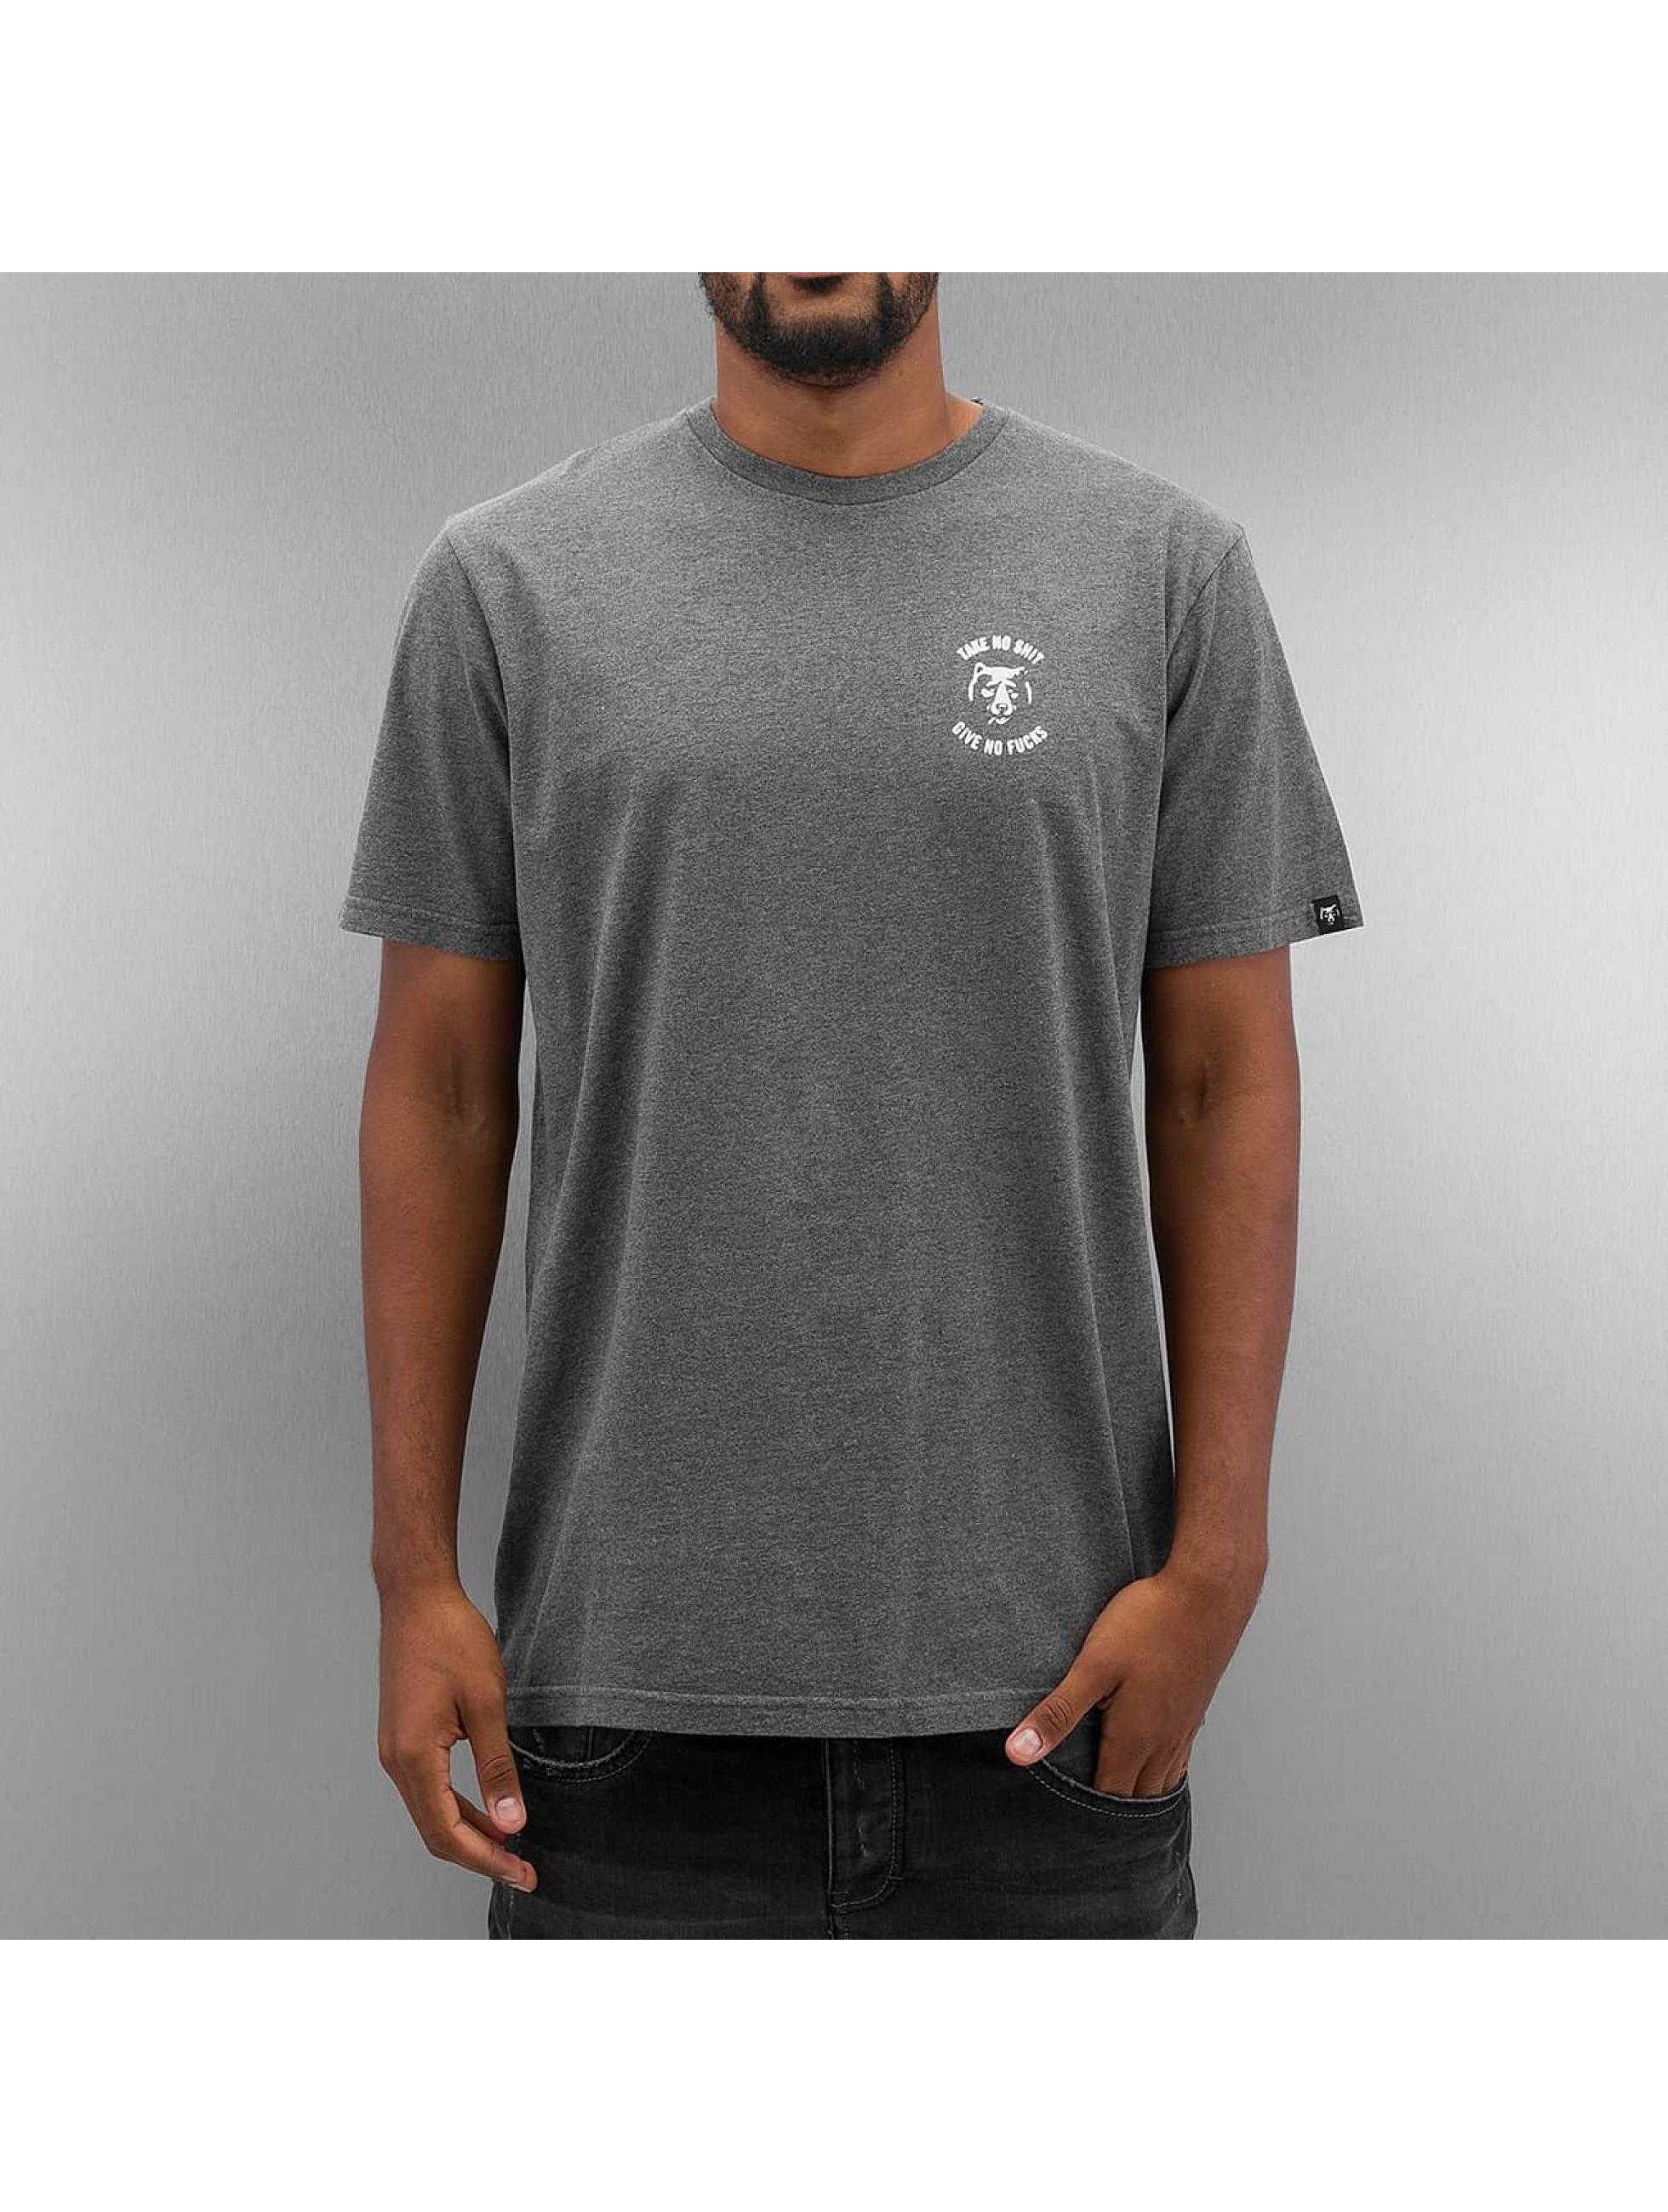 The Dudes T-Shirt SNGAF grau